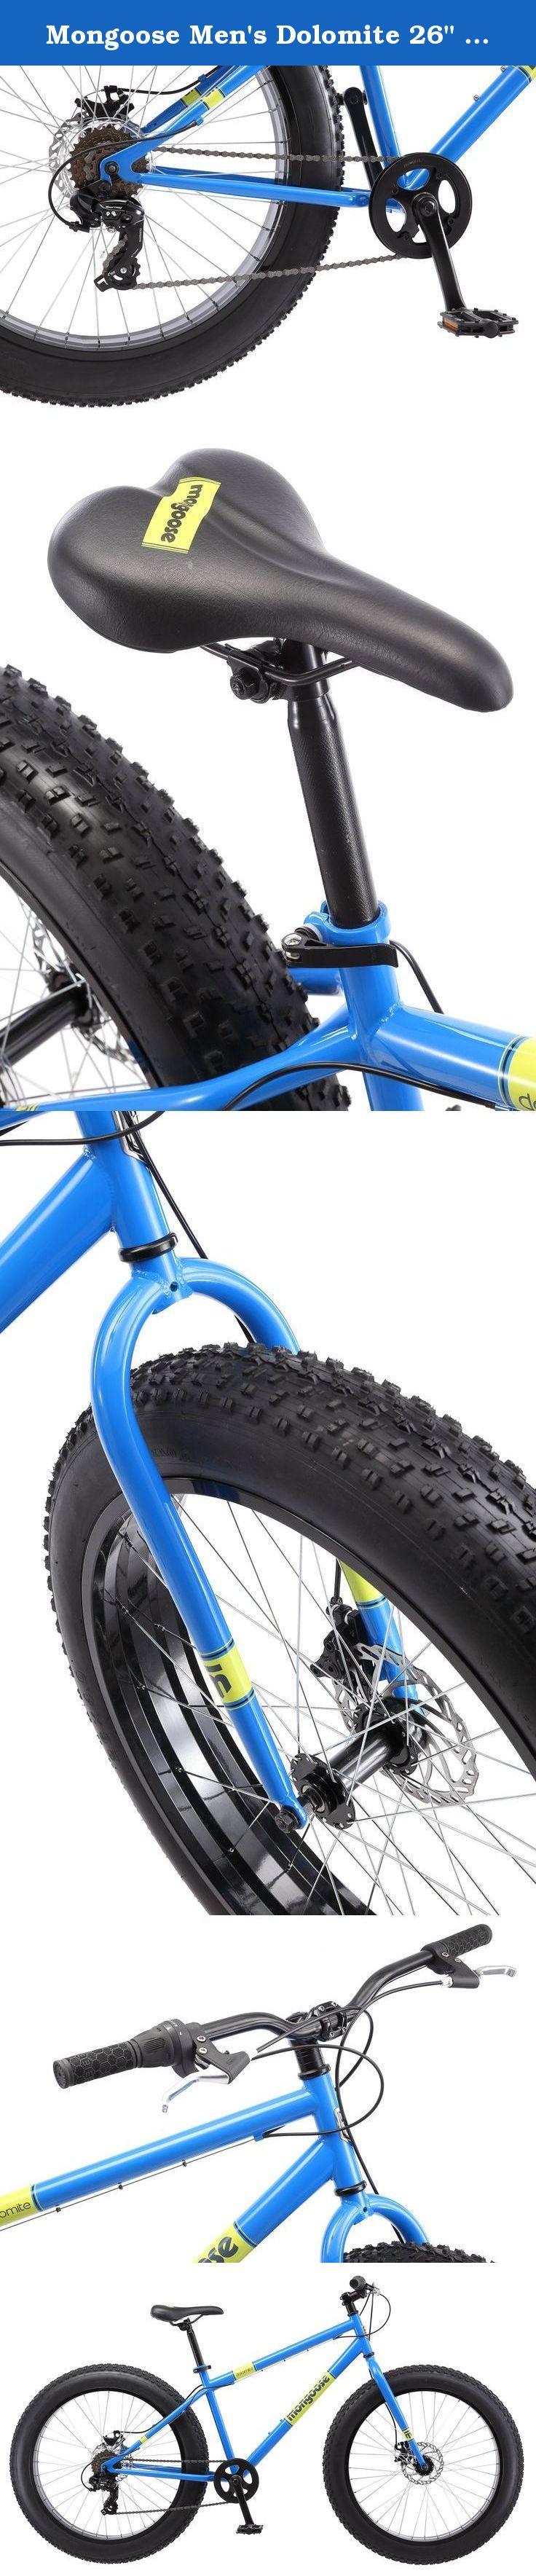 Mongoose Men S Dolomite 26 Wheel Fat Tire Bicycle Blue 18 Frame Size